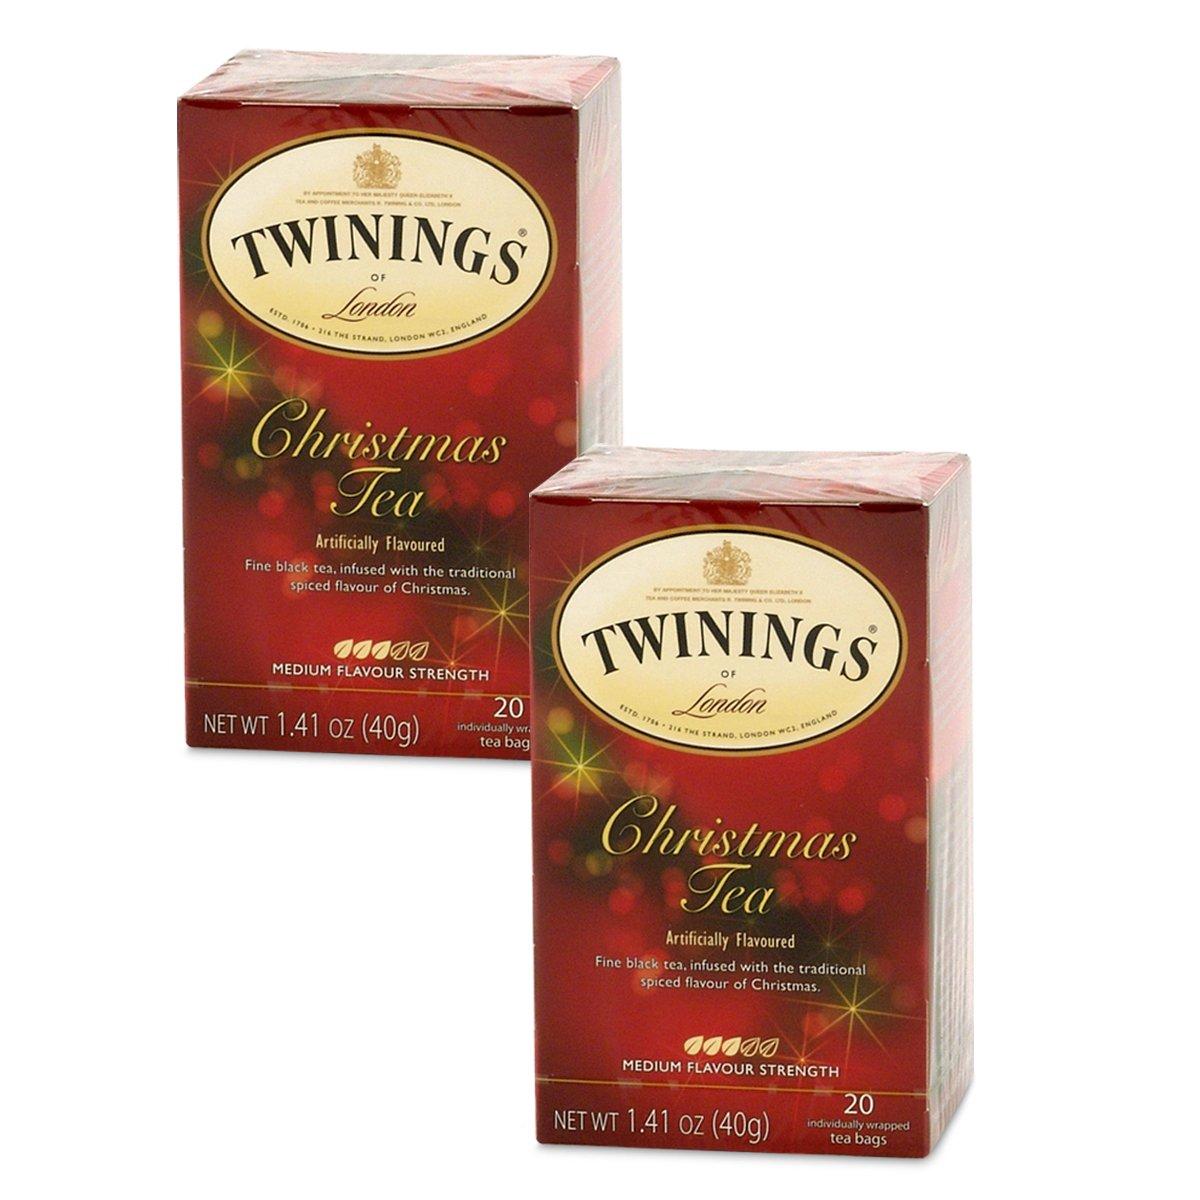 Twinings Christmas Tea - 20 count (2 PK)